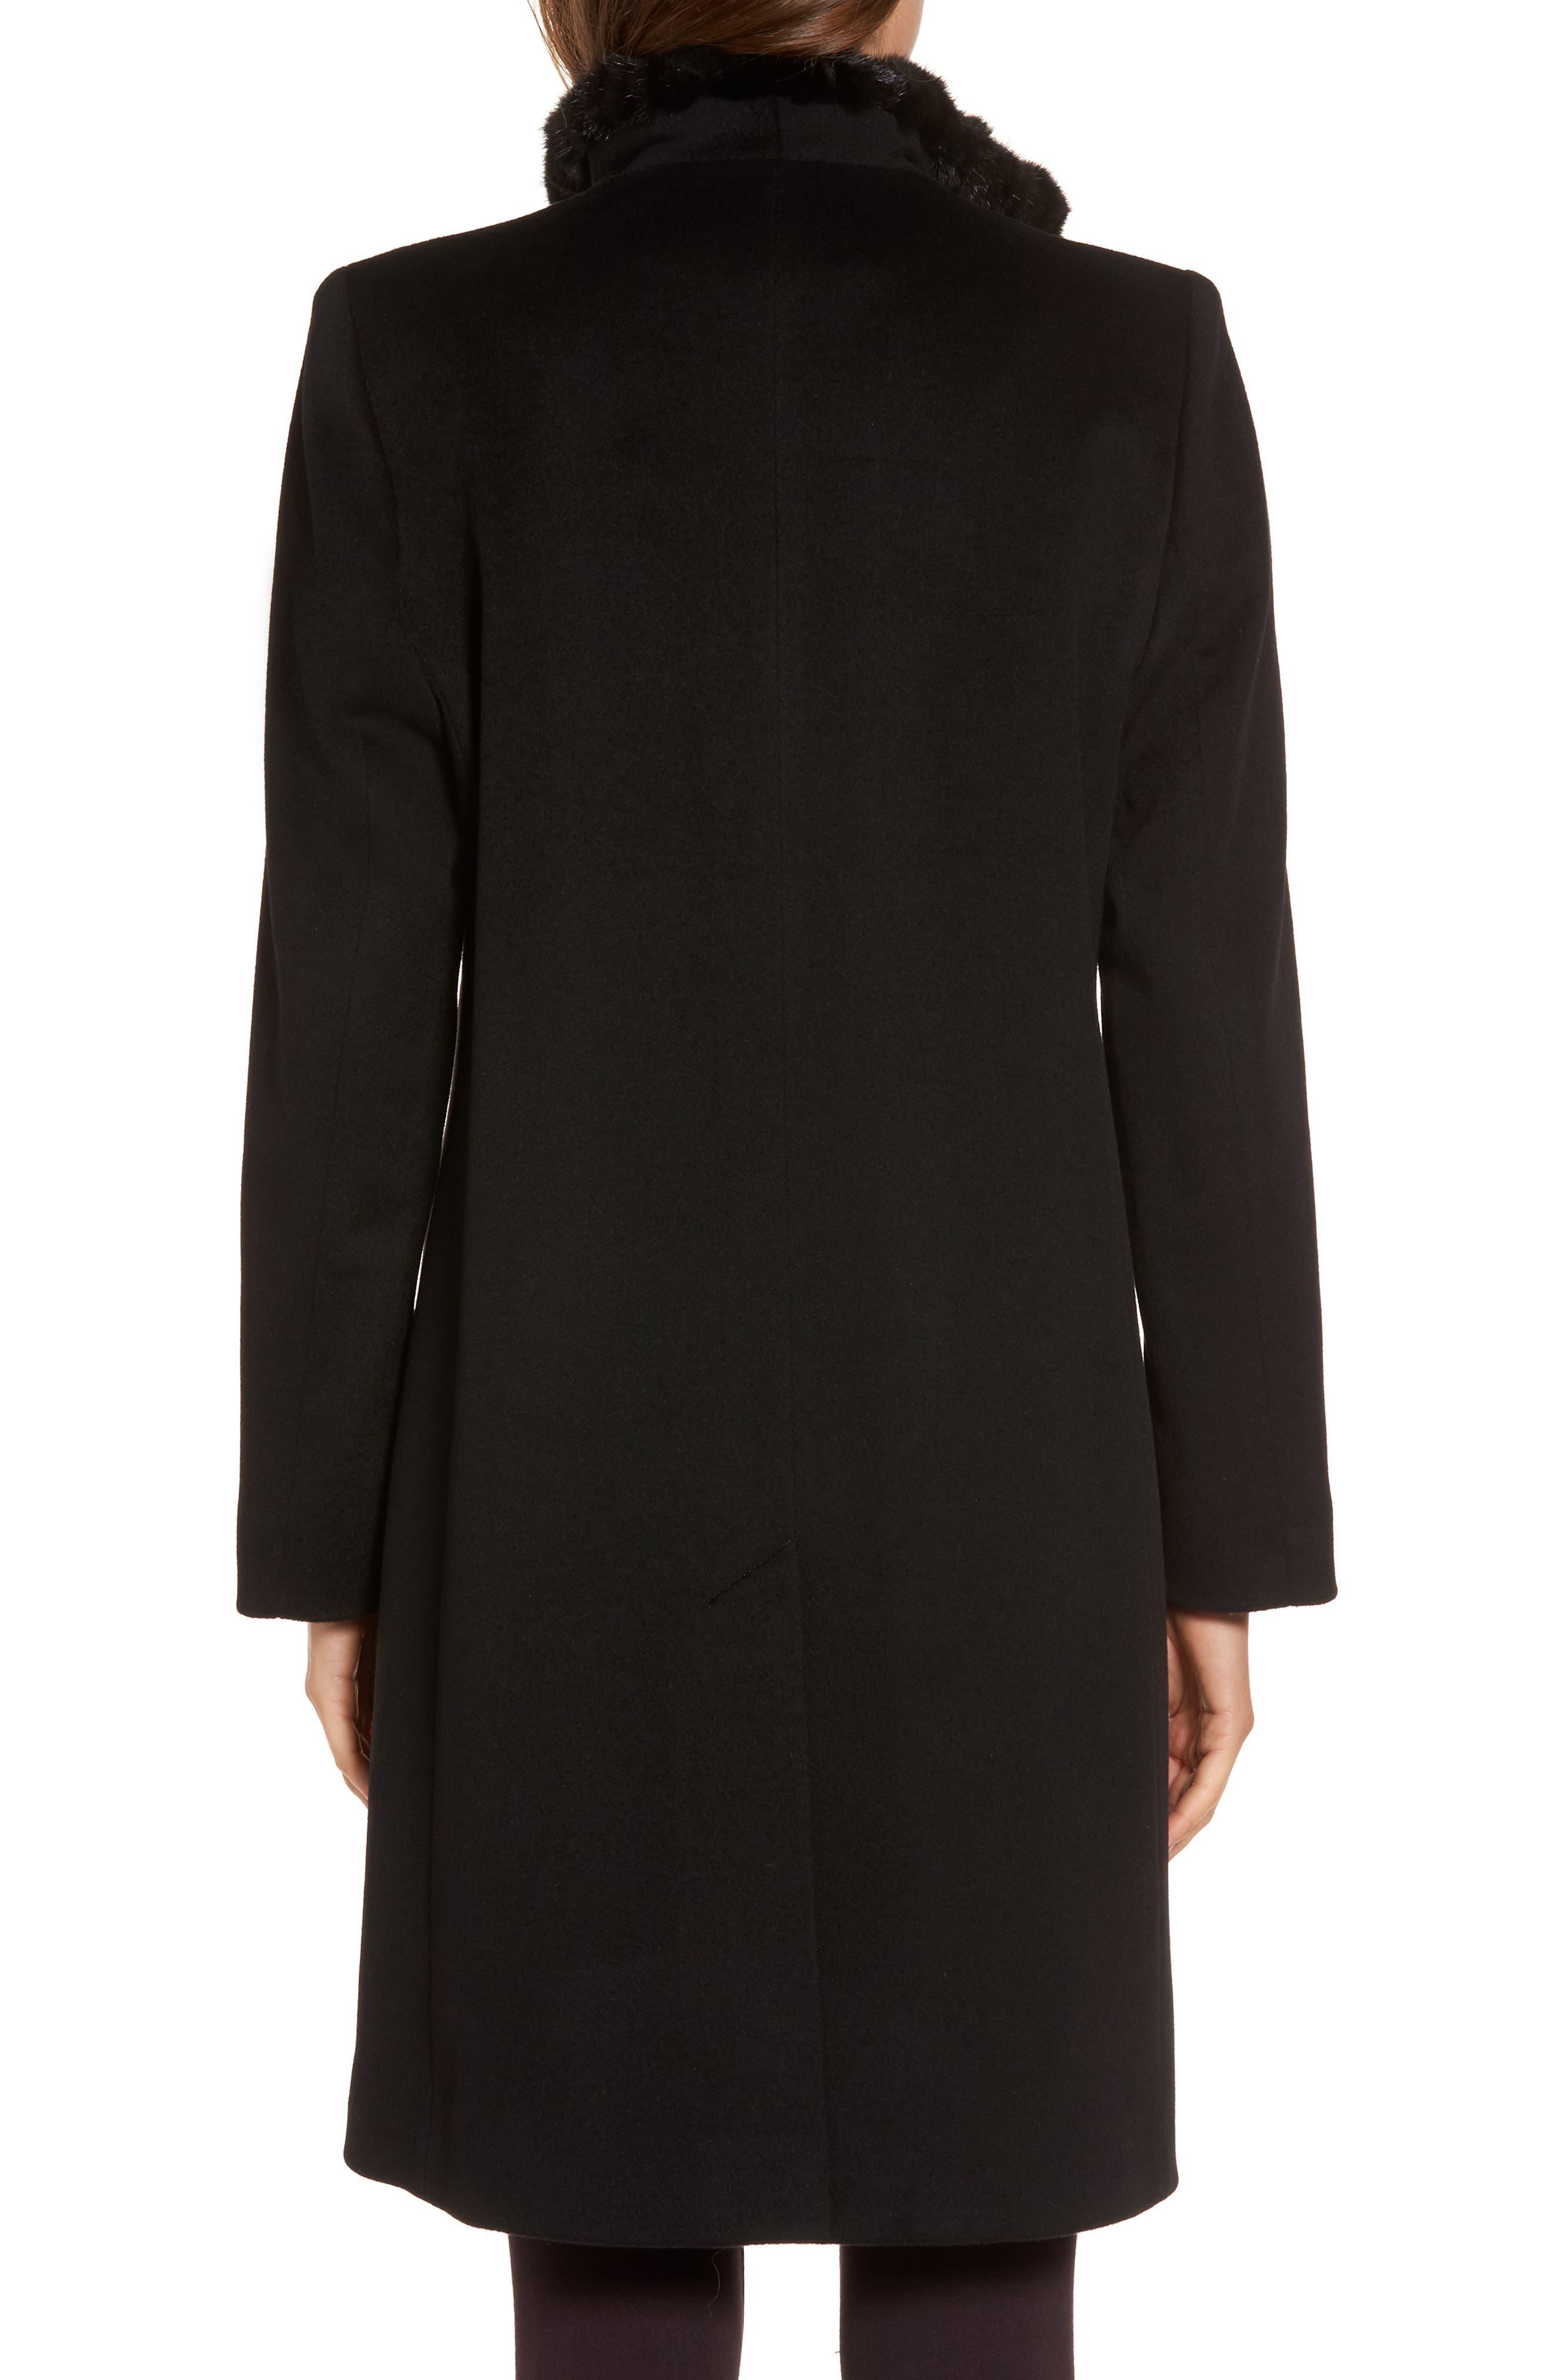 Loro Piana Wool Wing Collar Coat with Genuine Mink Trim,                             Alternate thumbnail 2, color,                             Black